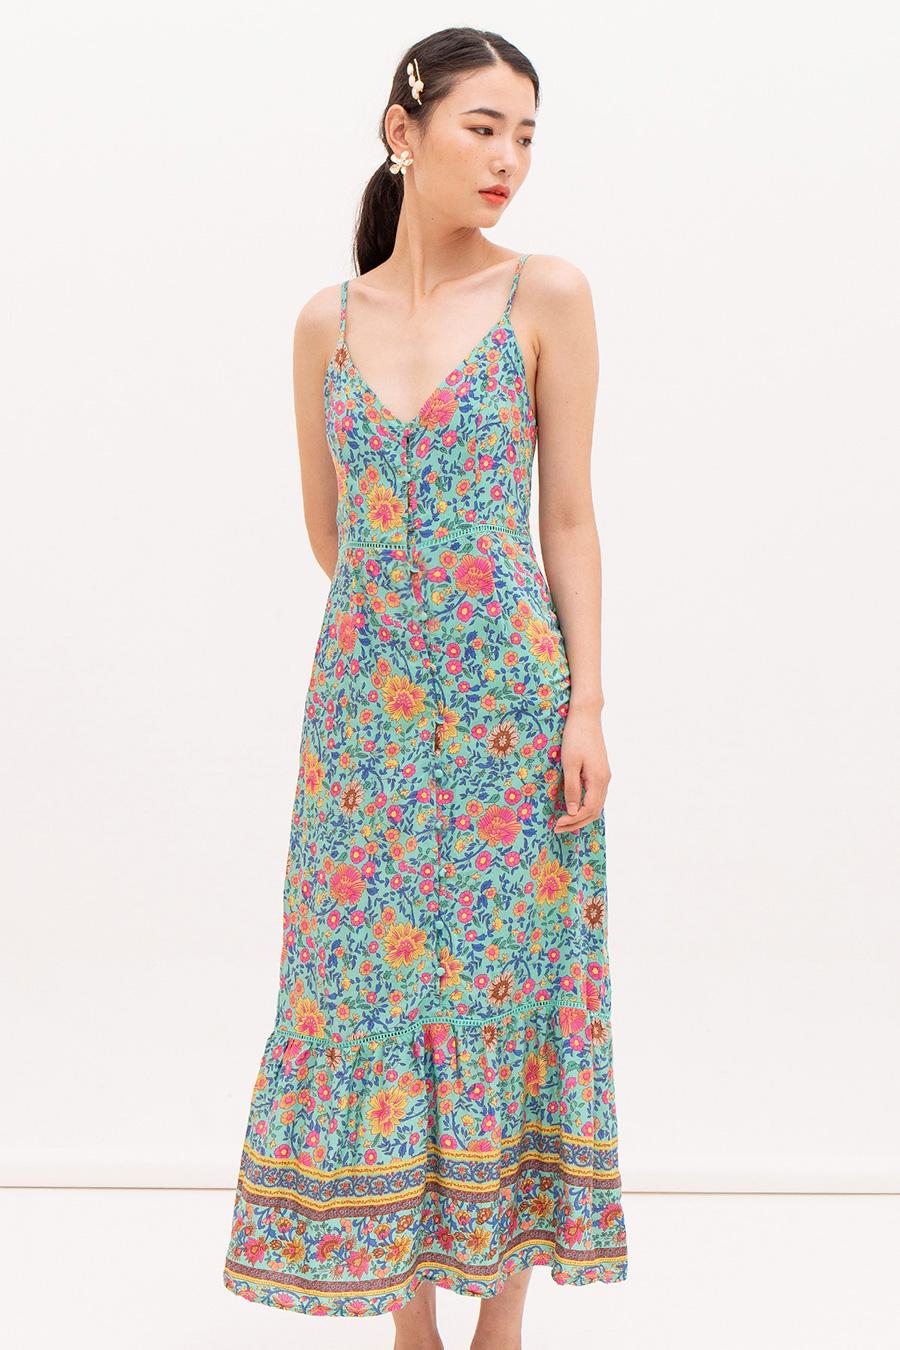 *RESTOCKED* ROMANE DRESS - PEONY